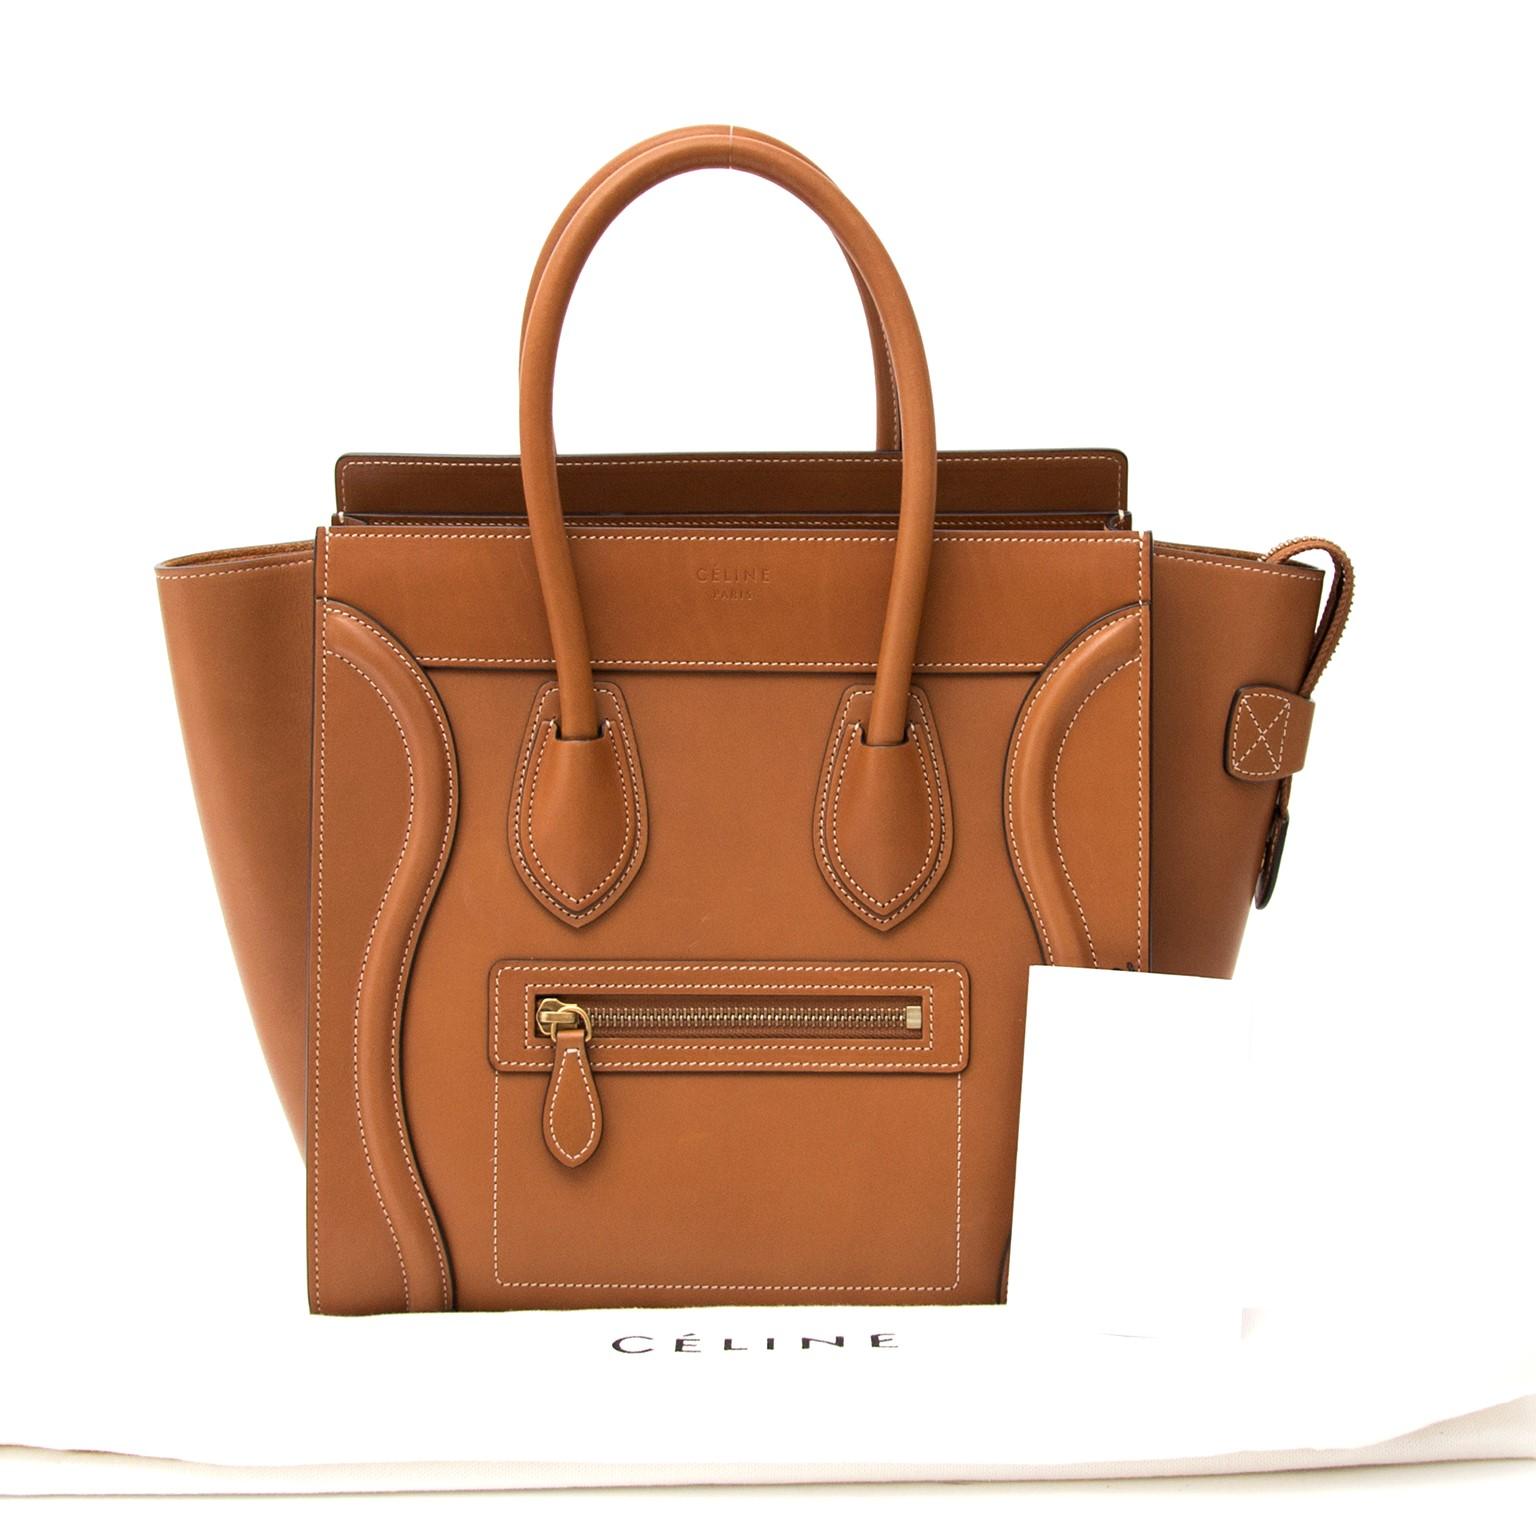 ecc3c0baf5 Safe and Vintage Céline micro debossed luggage handbag for the best price  at Labellov webshop. Safe and